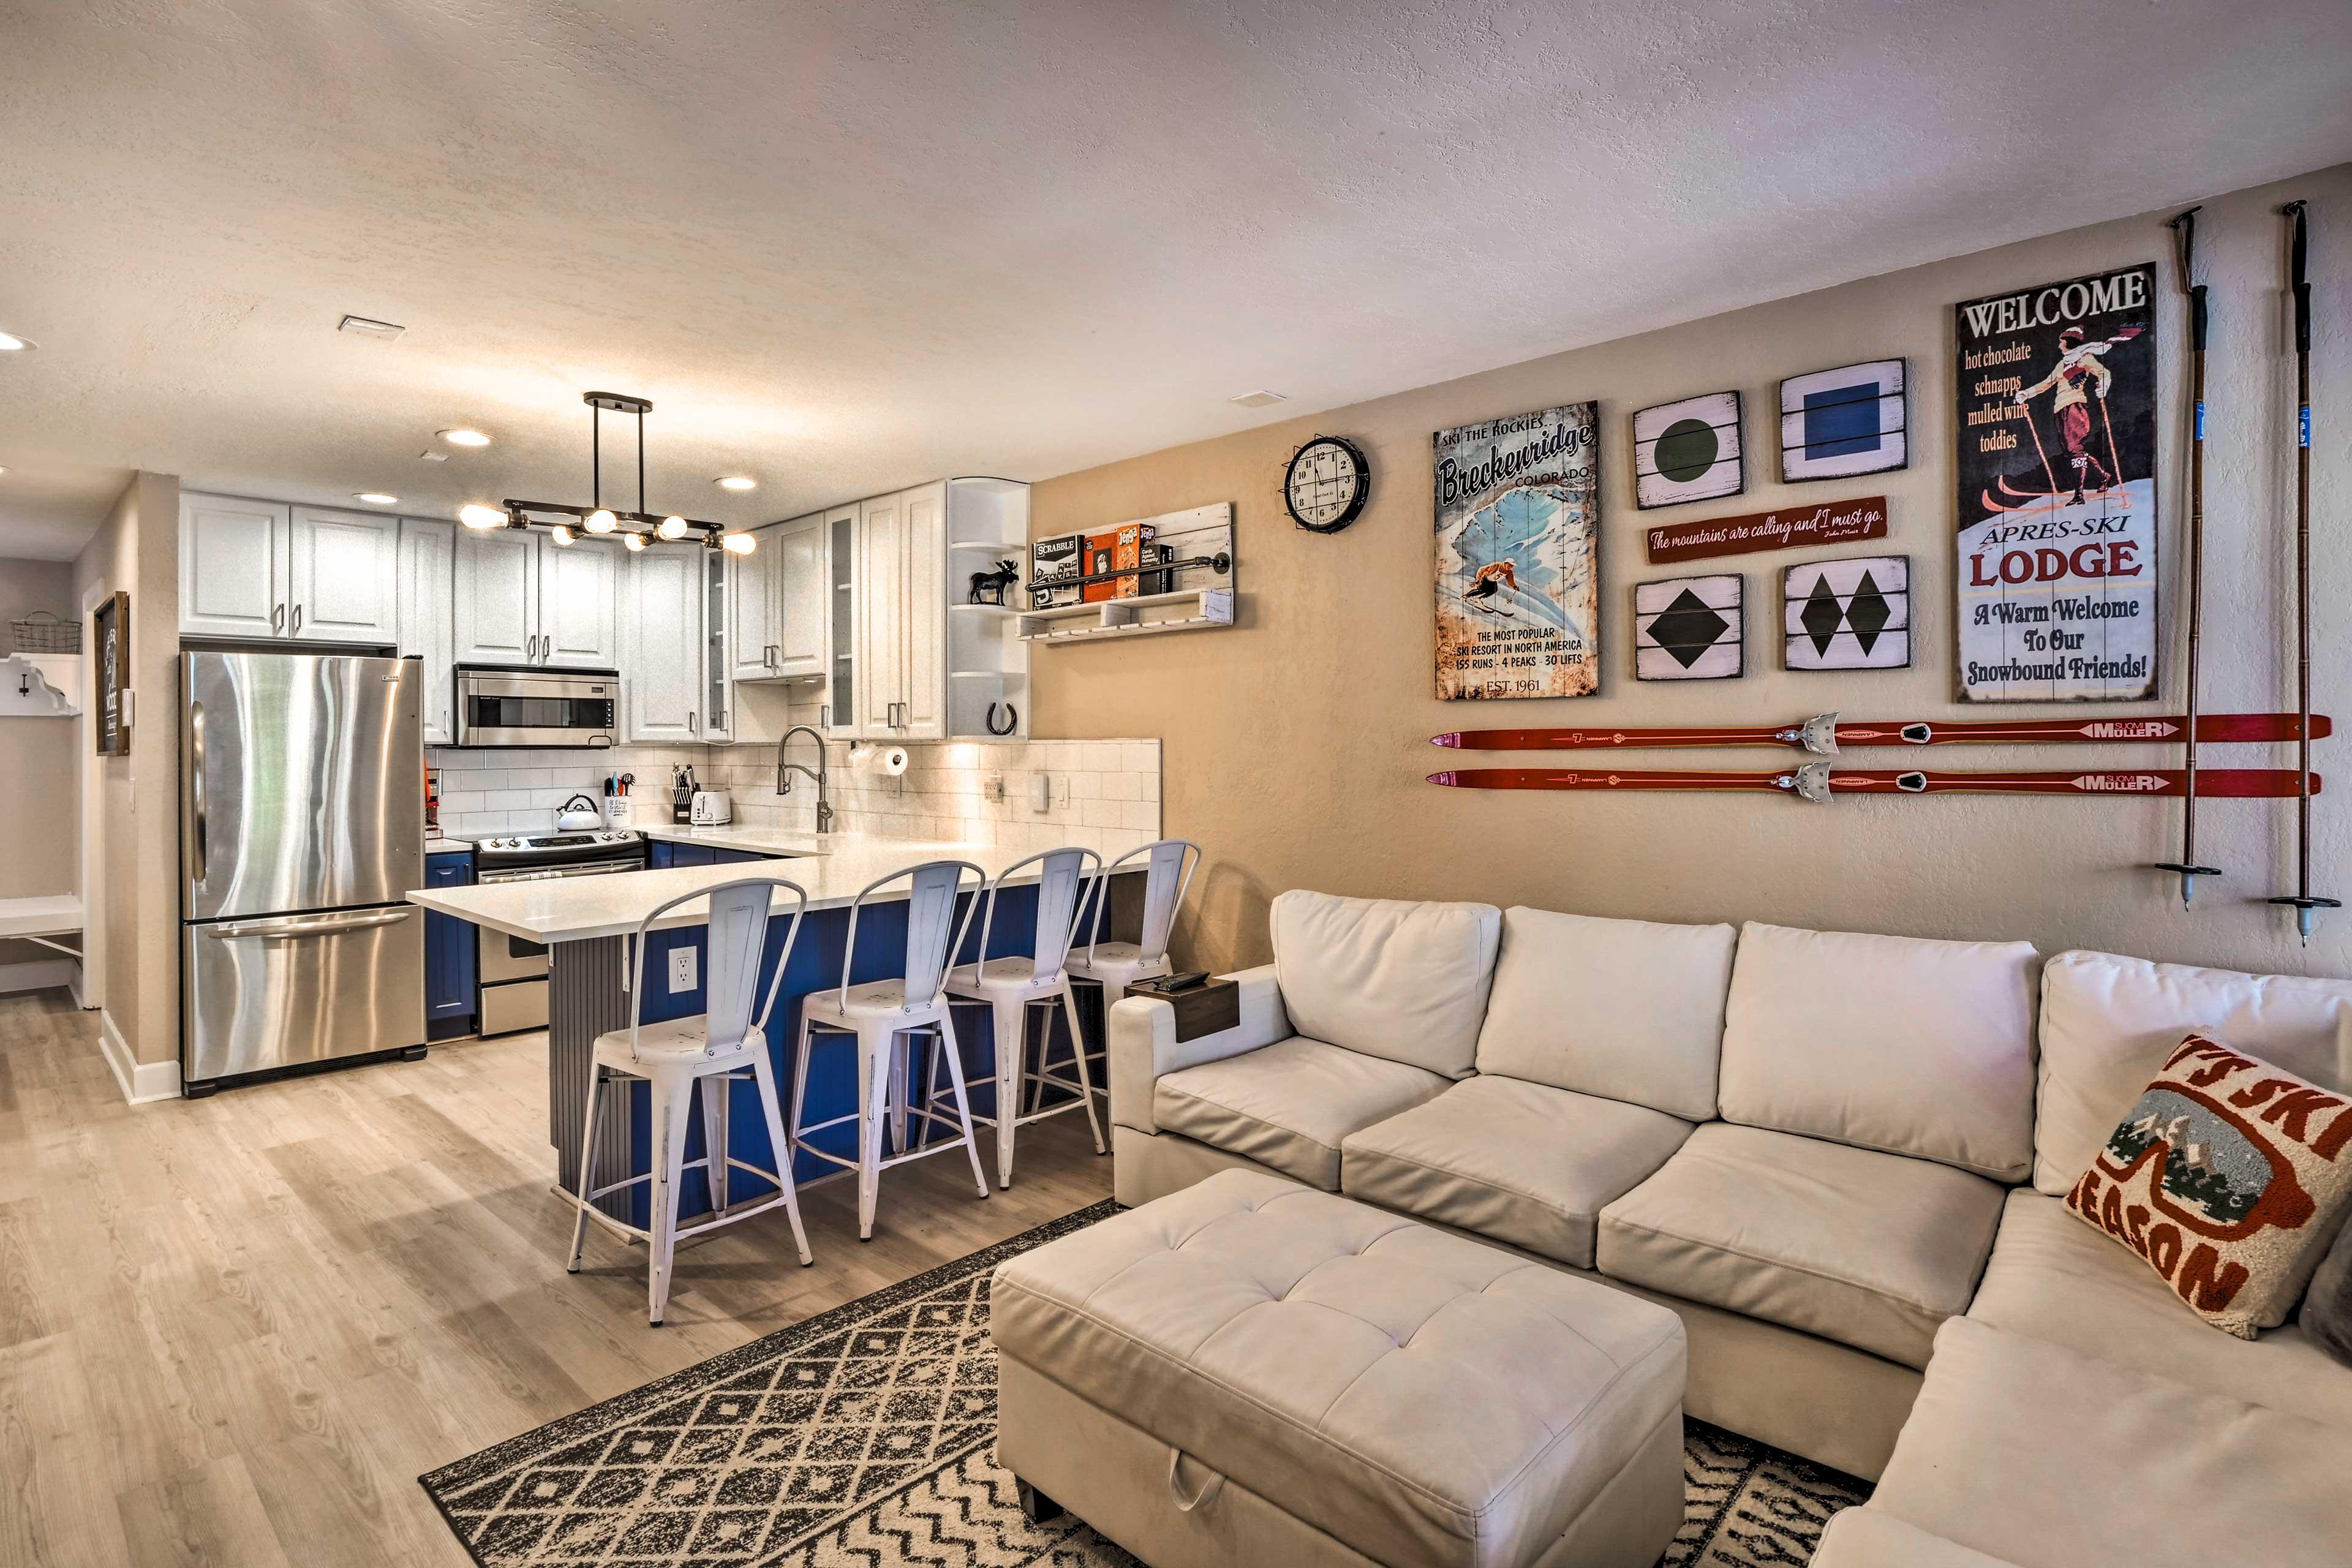 Breckenridge Vacation Rental | 3BR | 3BA | 1,700 Sq Ft | 3 Stories